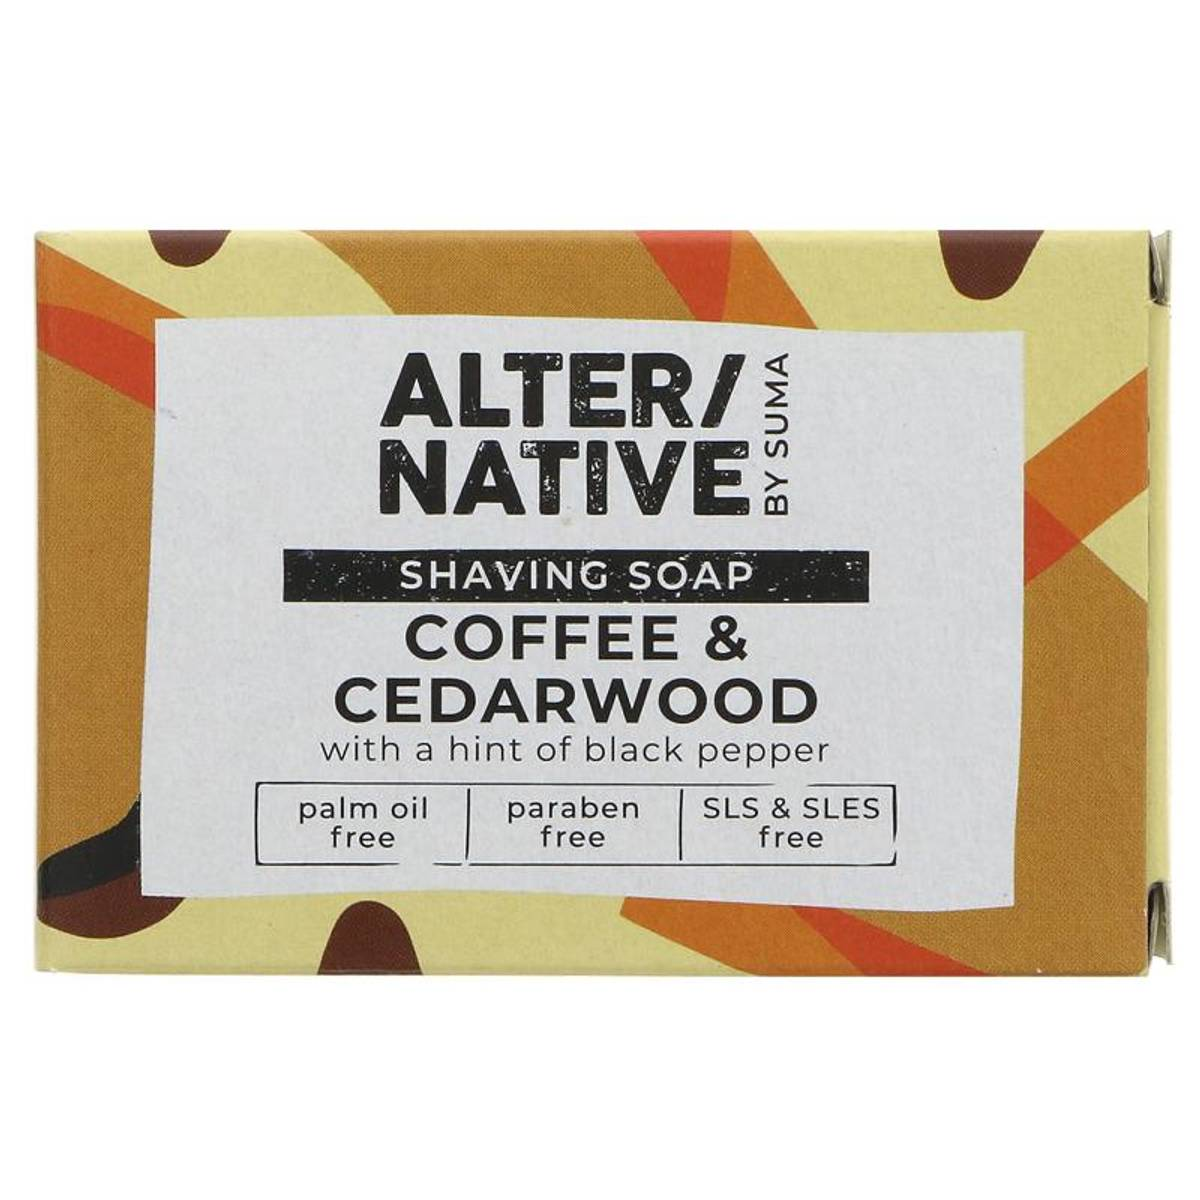 Barbersåpe Coffee & Cedarwood 95g / Alter/native